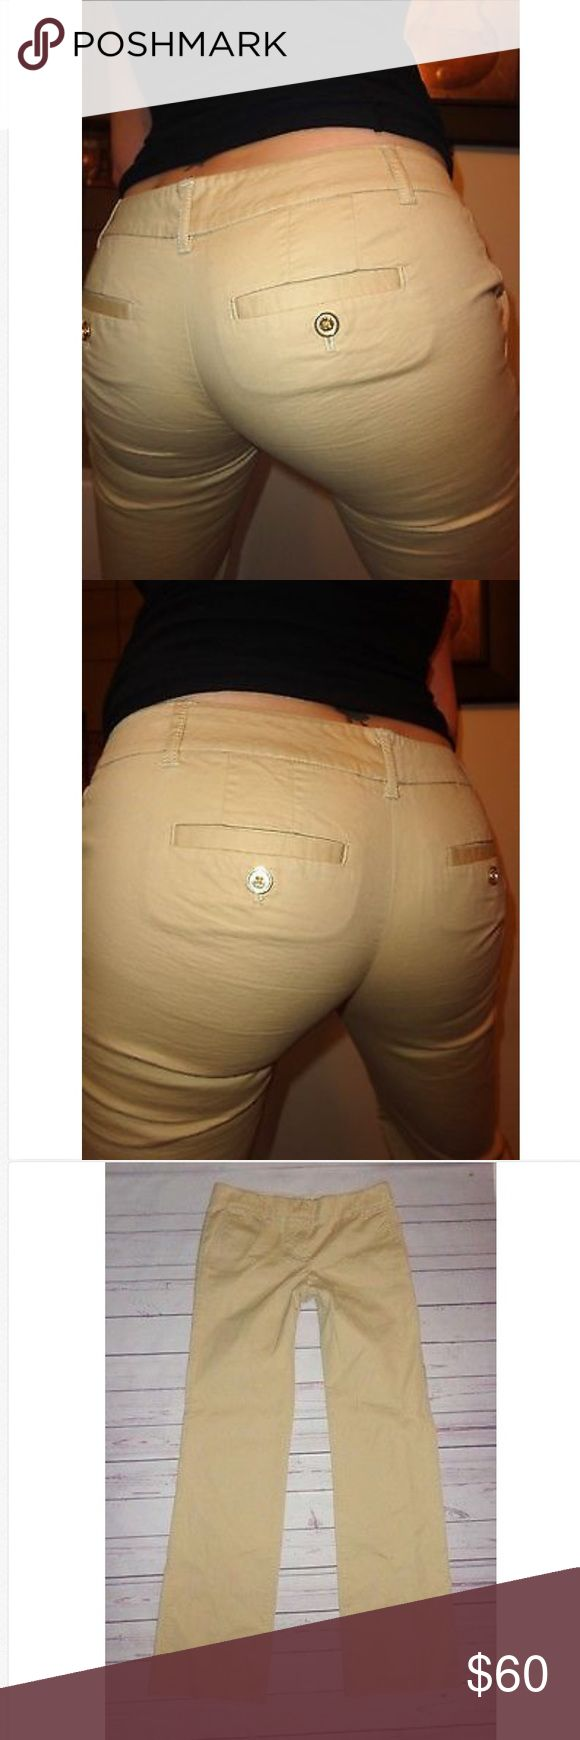 TORY BURCH Tan Slacks Pants w/Flap Pockets! 4 x 33 TORY BURCH Tan Khaki Slacks Pants w/Flap Pockets & Gold Buttons! Size 4 x 33 Great Used! 98% cotton & 2% spandex Tory Burch Pants Trousers